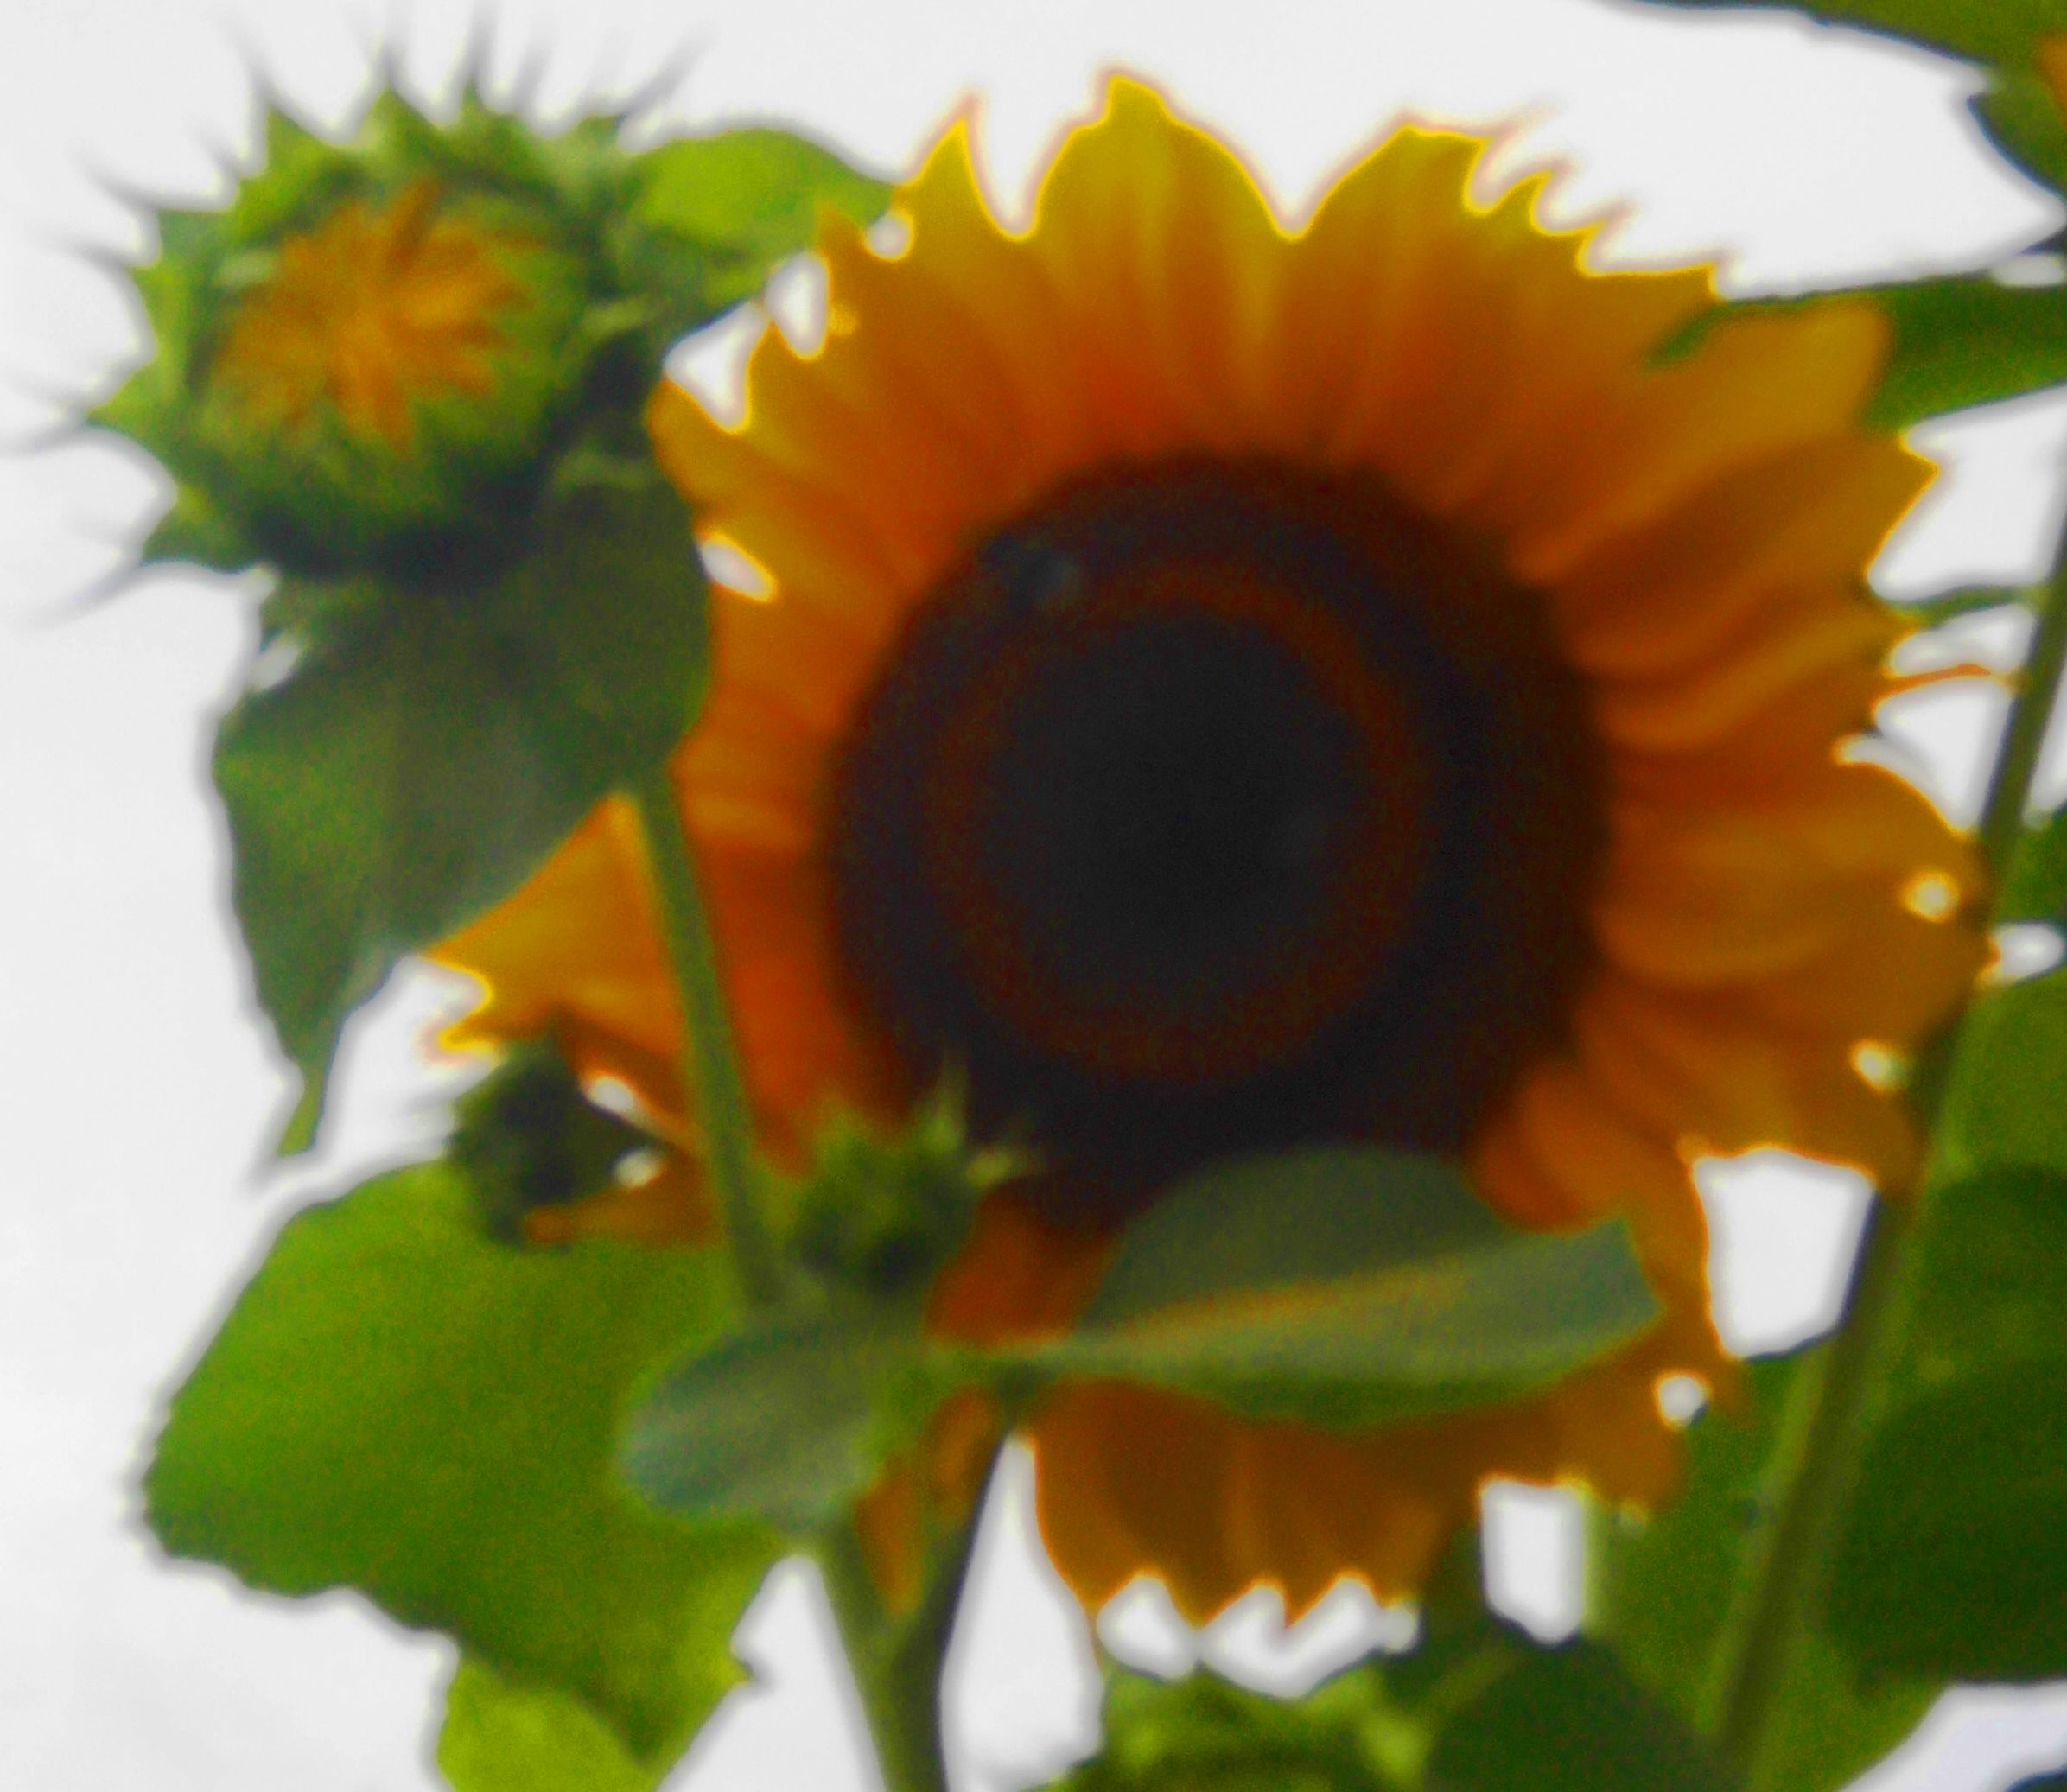 Sonnenblume8